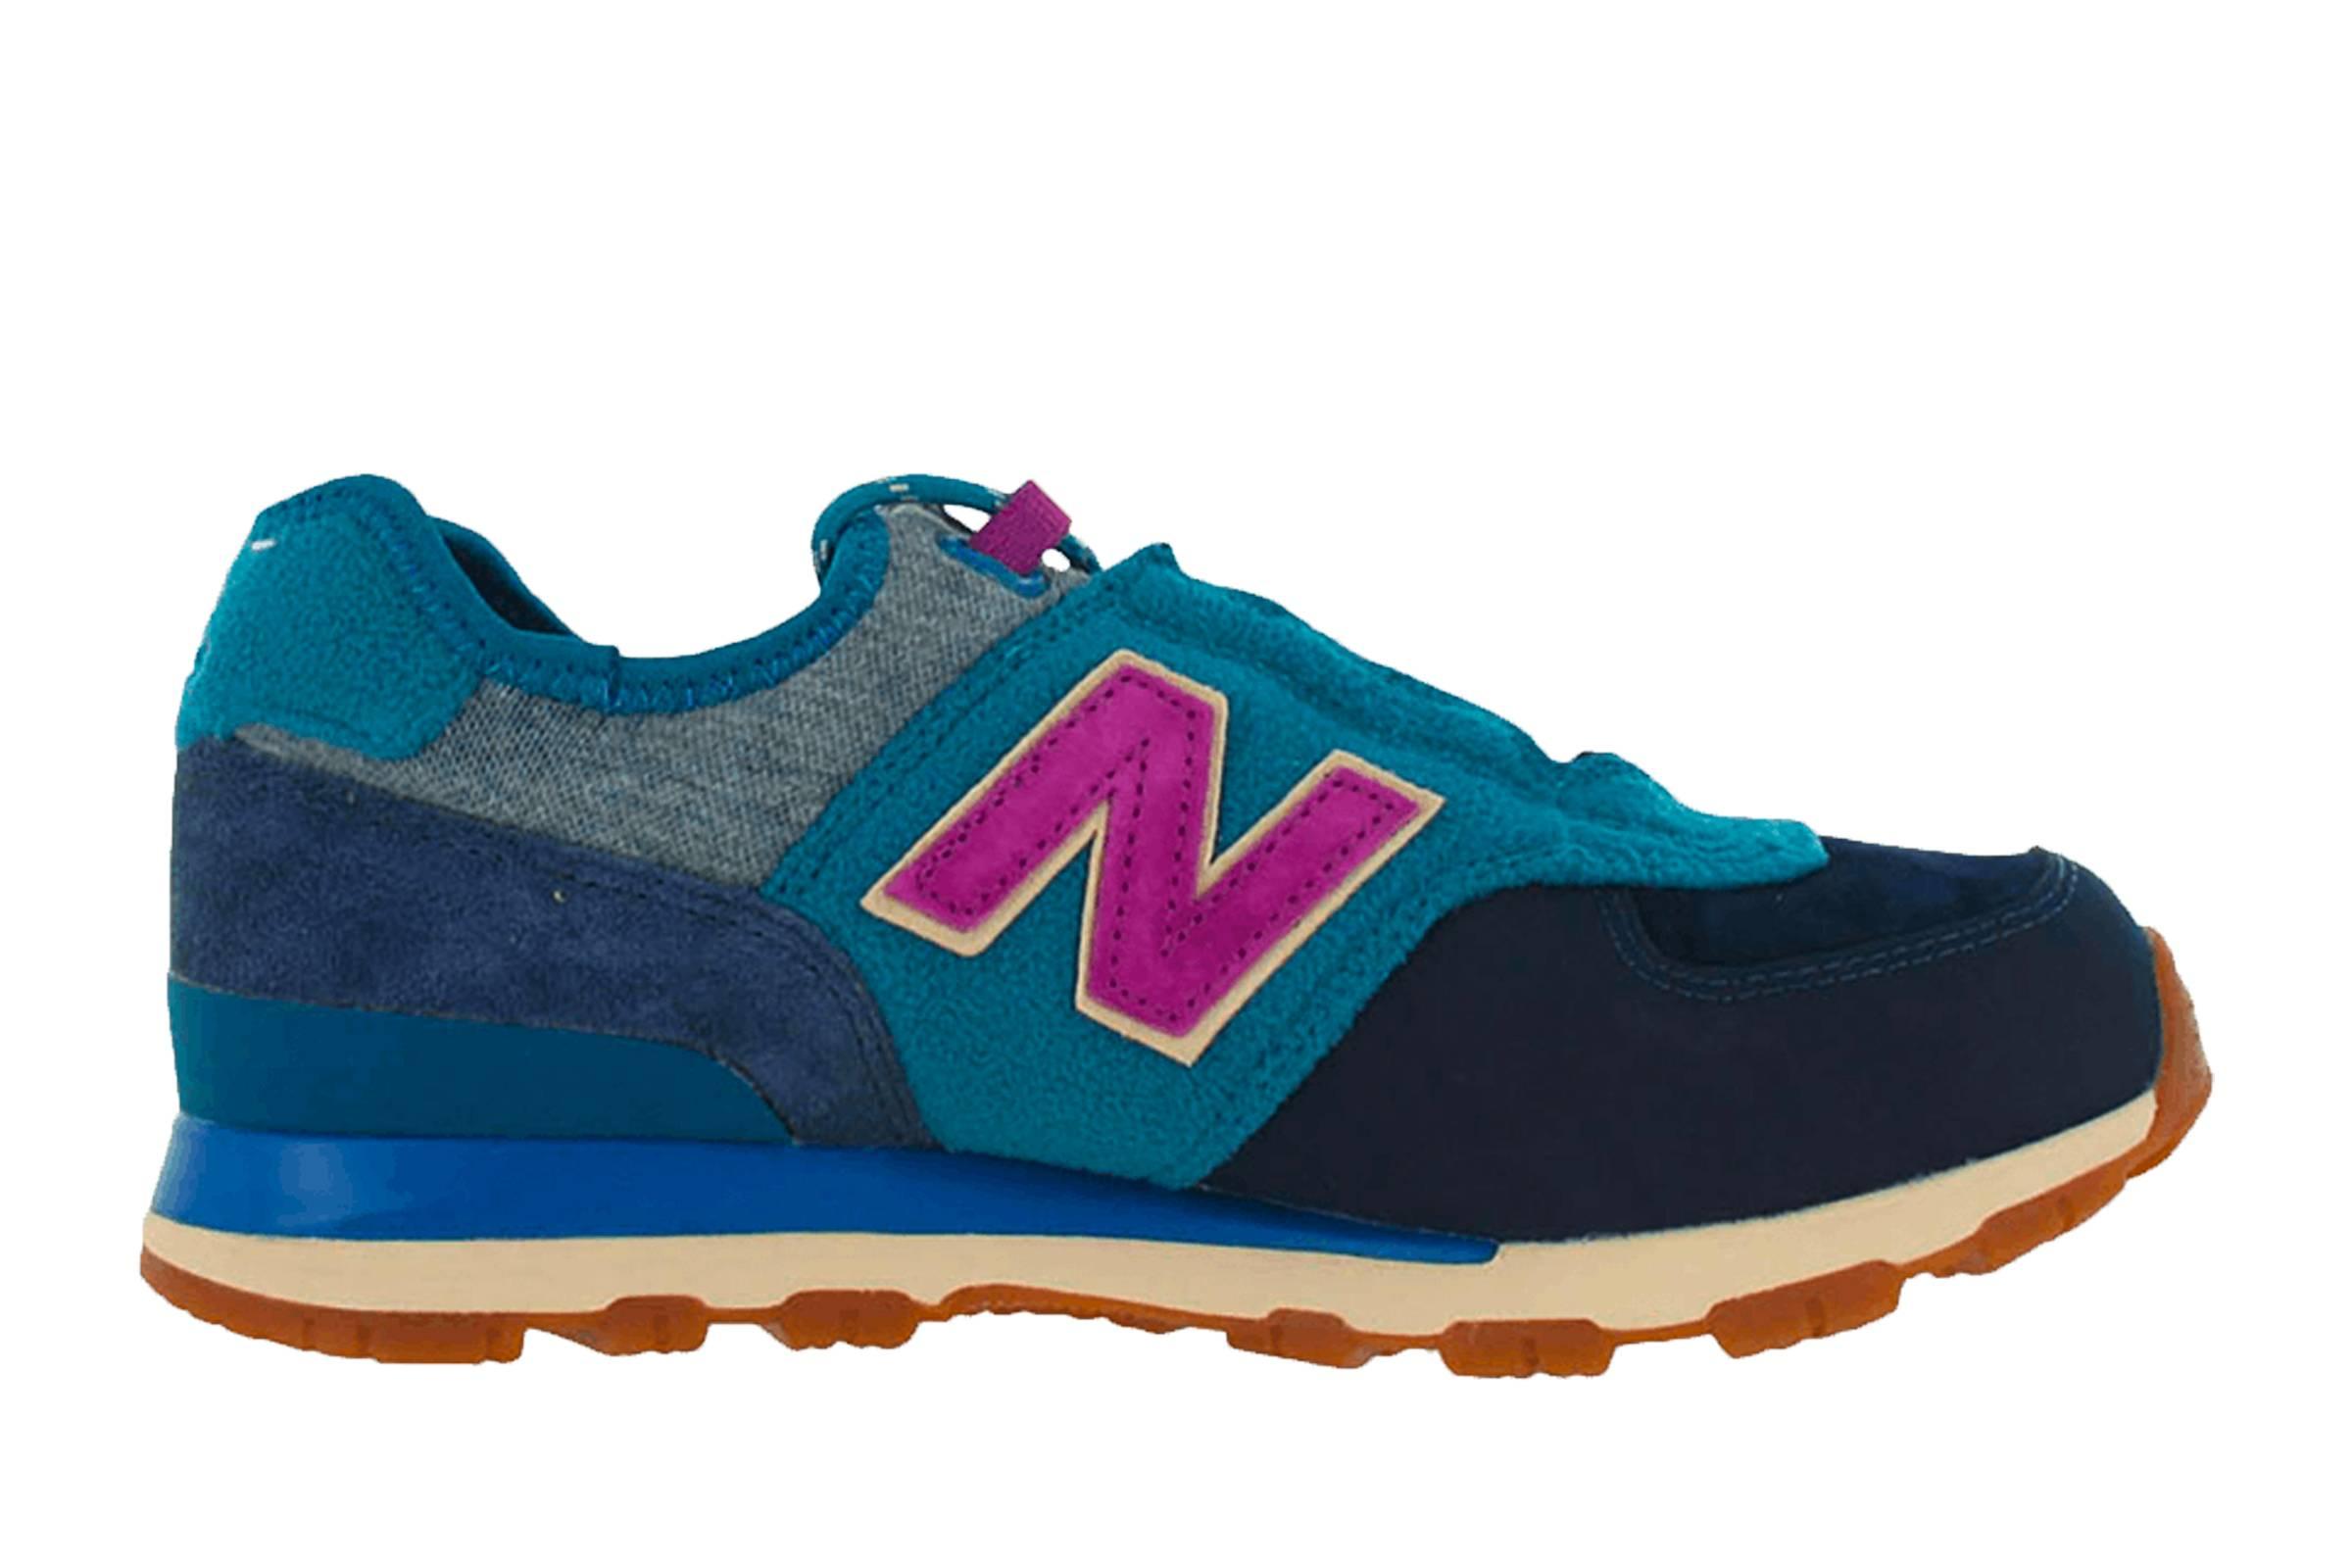 Bodega x New Balance 581